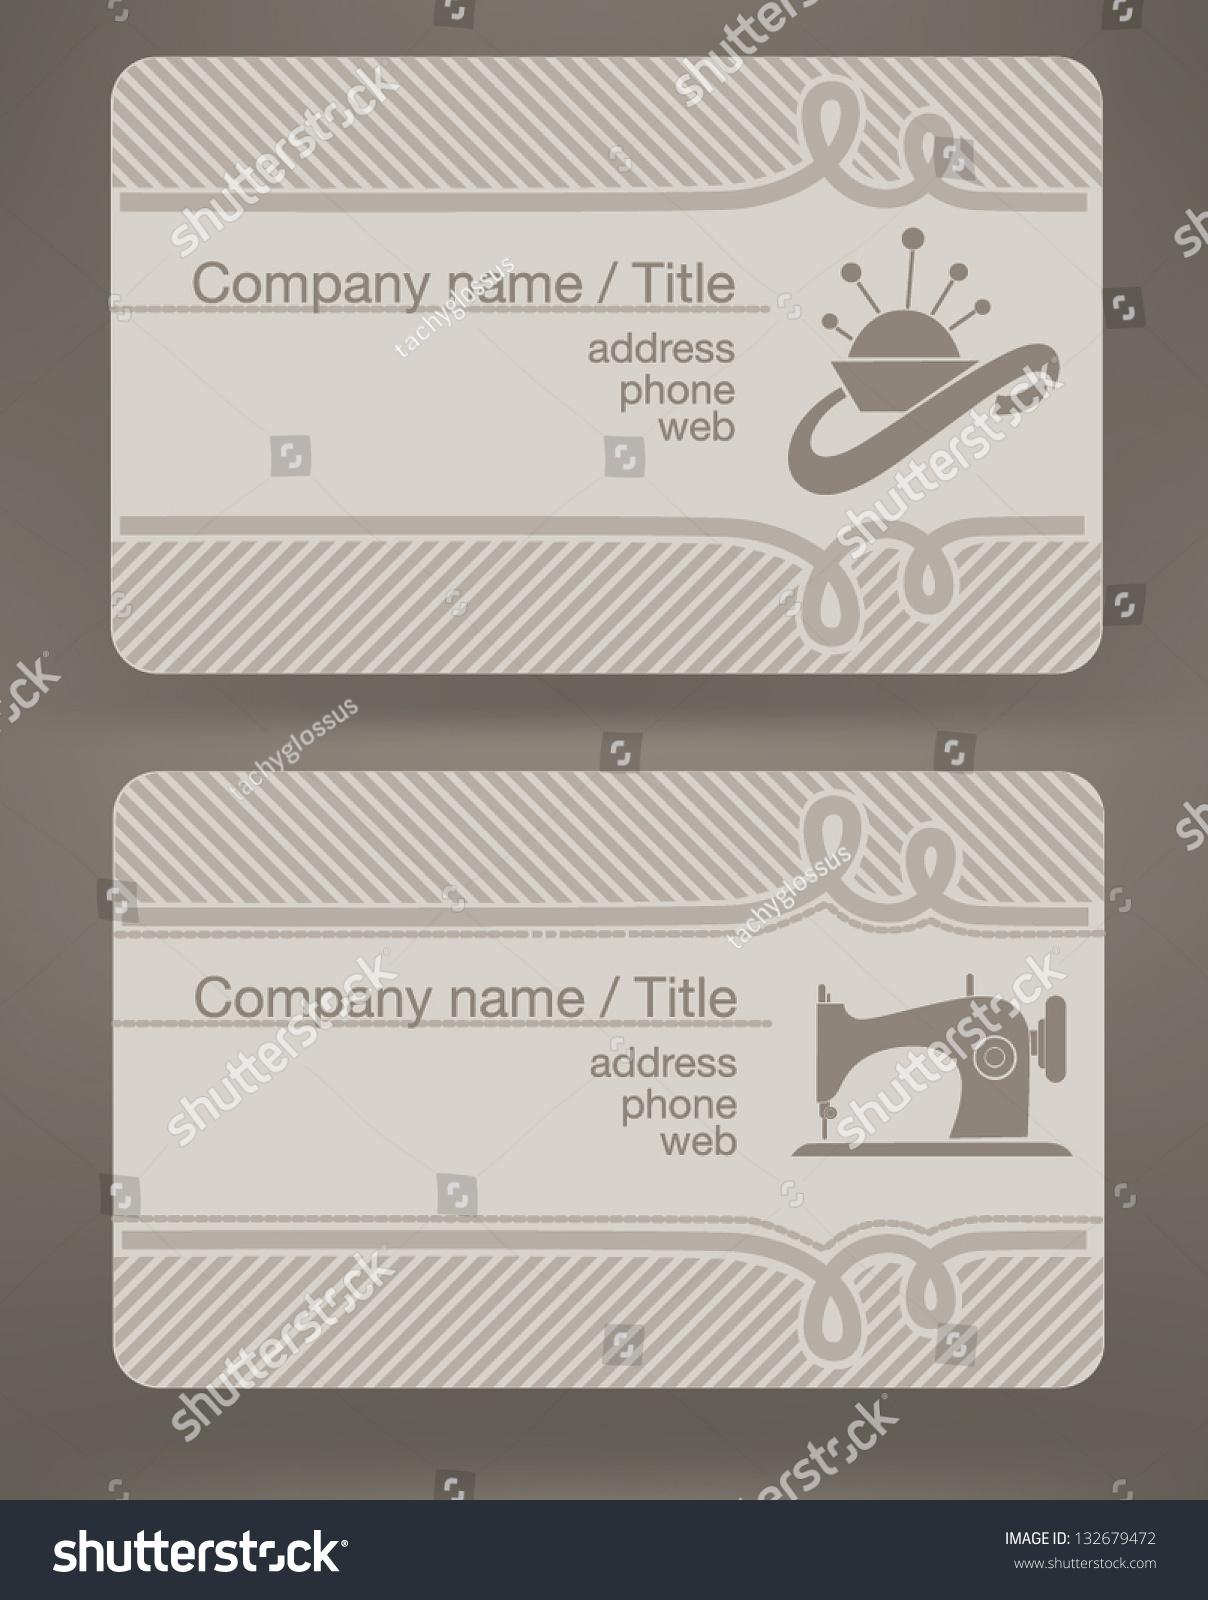 Business cards fashion designer tailor stock vector 132679472 business cards for fashion designer and tailor magicingreecefo Images